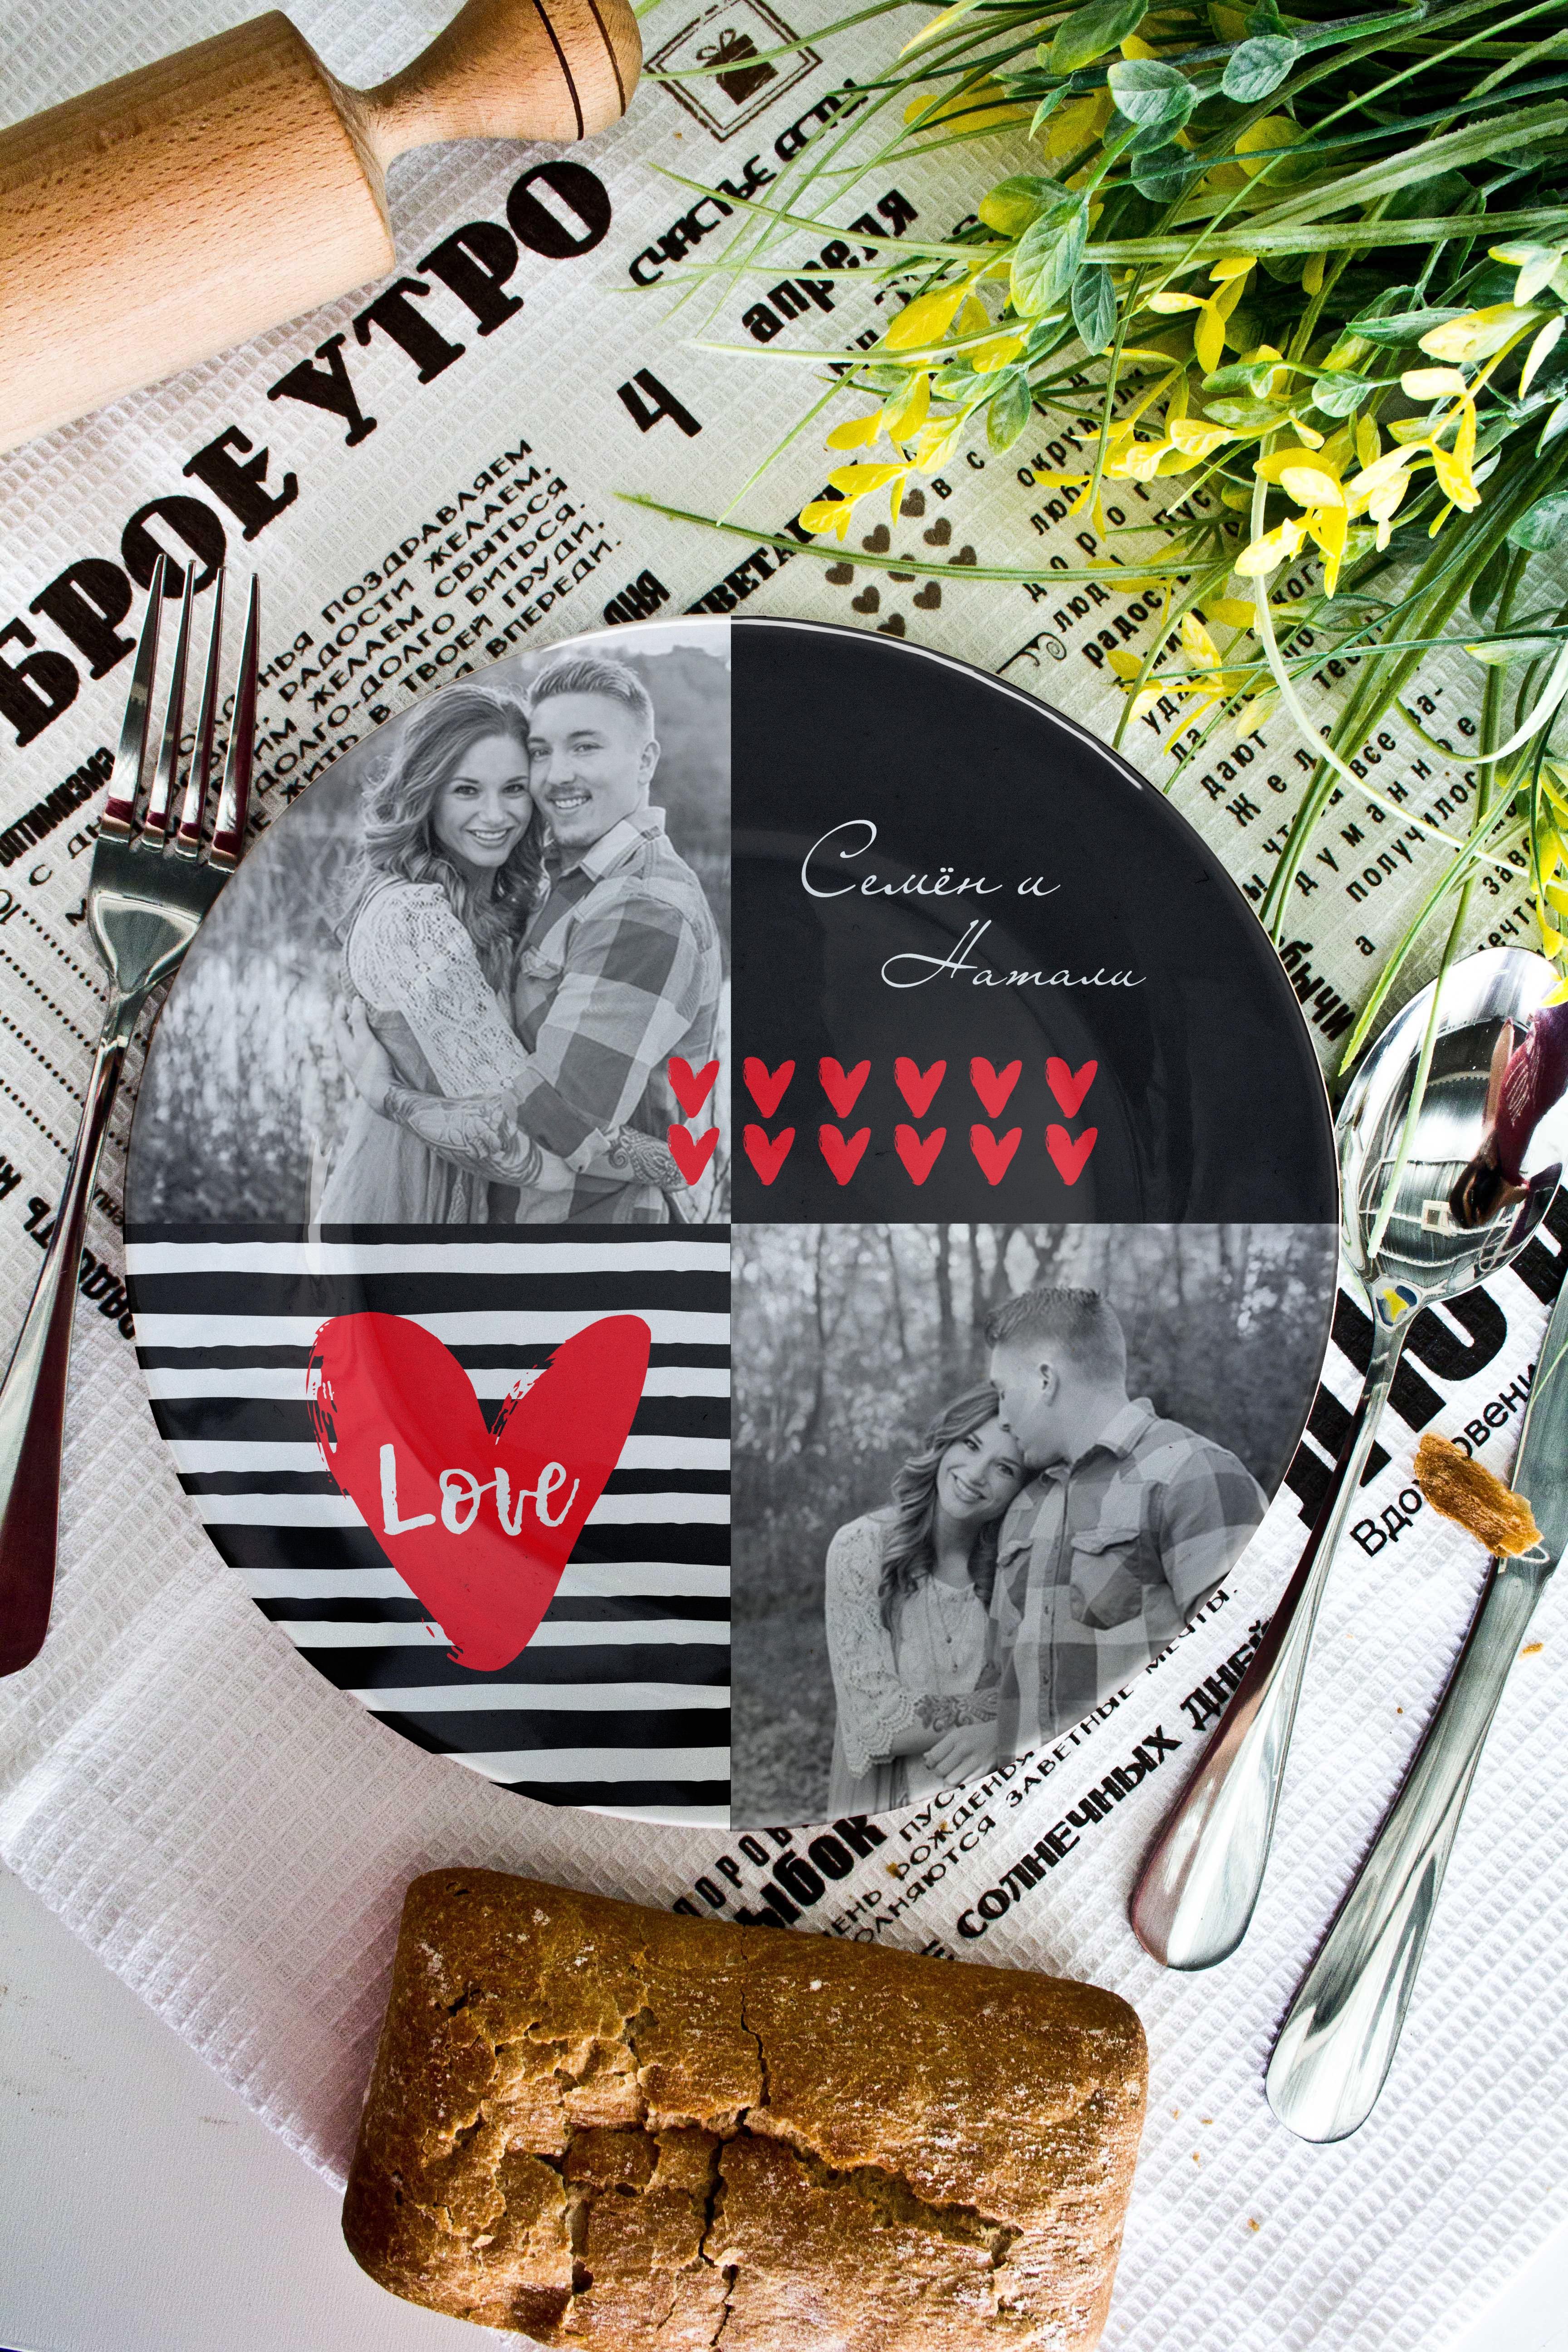 Тарелка декоративная с вашим текстом Живи, Смейся, ЛюбиТарелки и пиалы<br>Тарелка диаметром 20см с Вашим текстом<br>